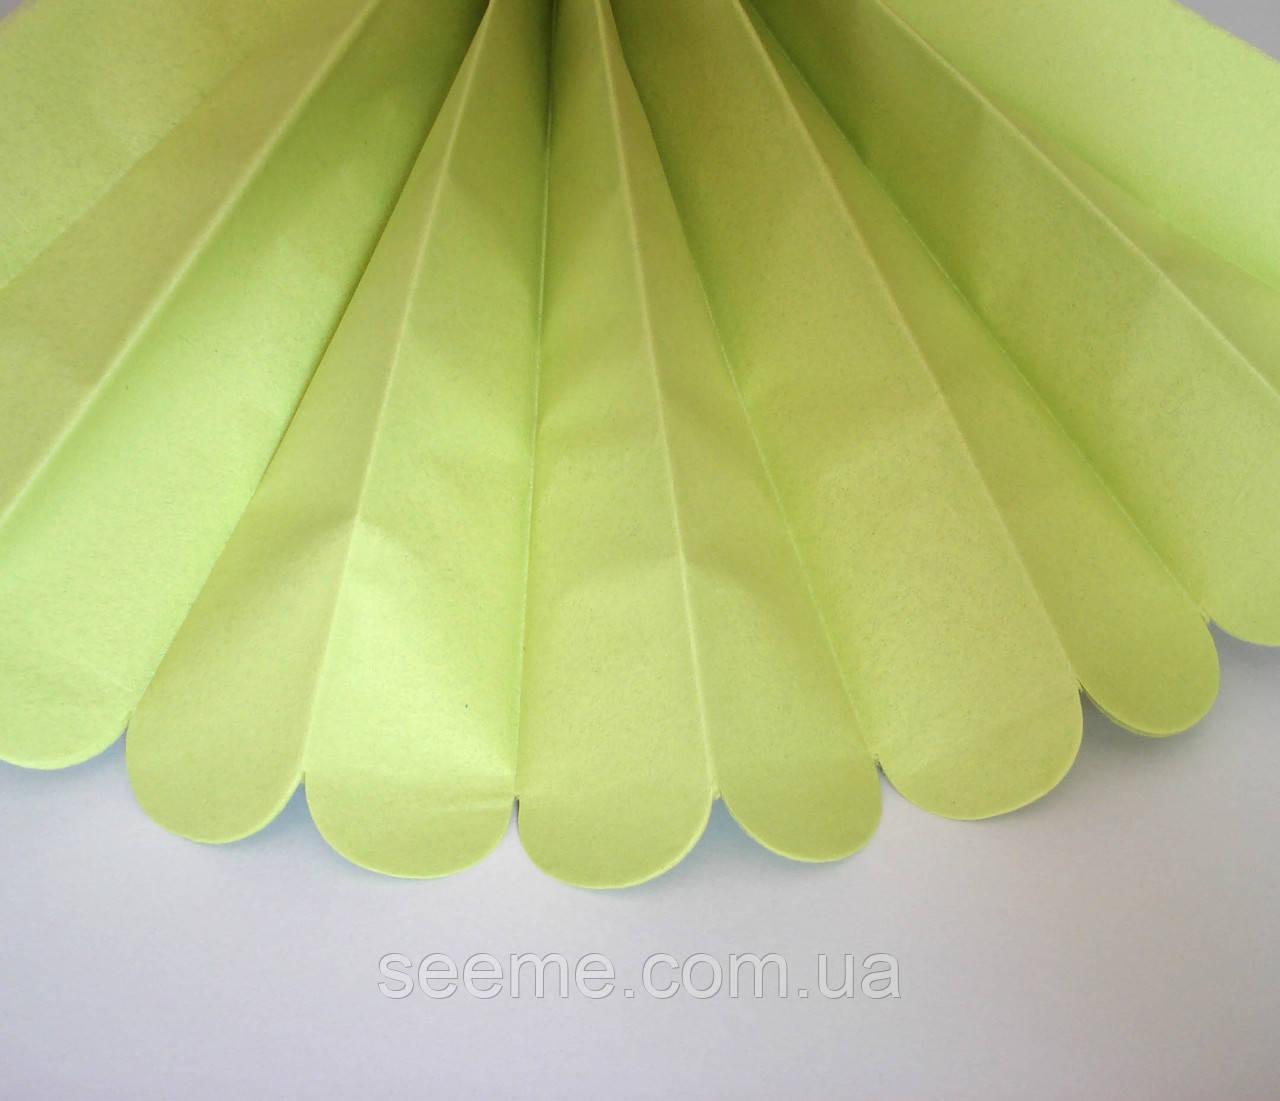 Паперові помпони з тишею «Pistachio», діаметр 25 див.